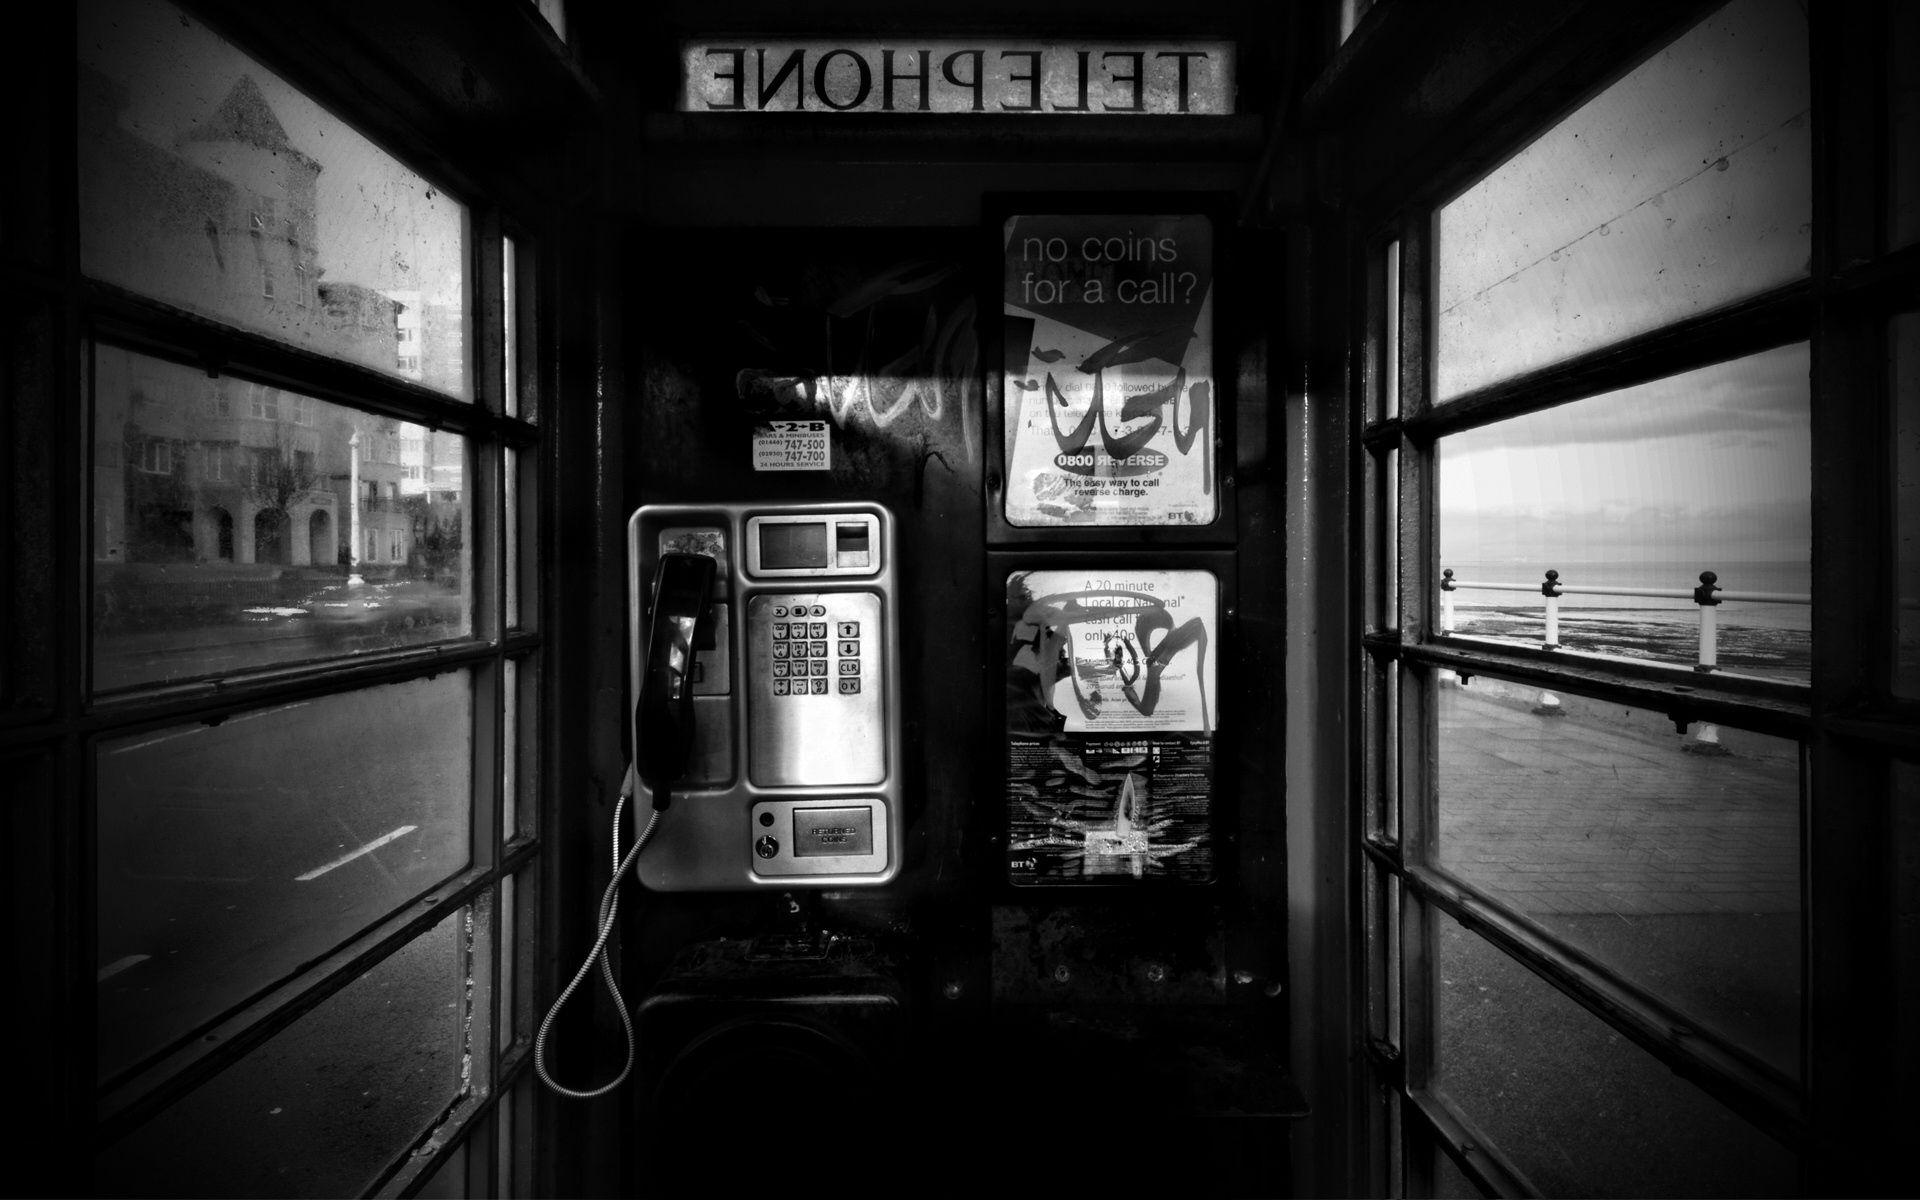 Cabina Telefonica : Cabina telefonica